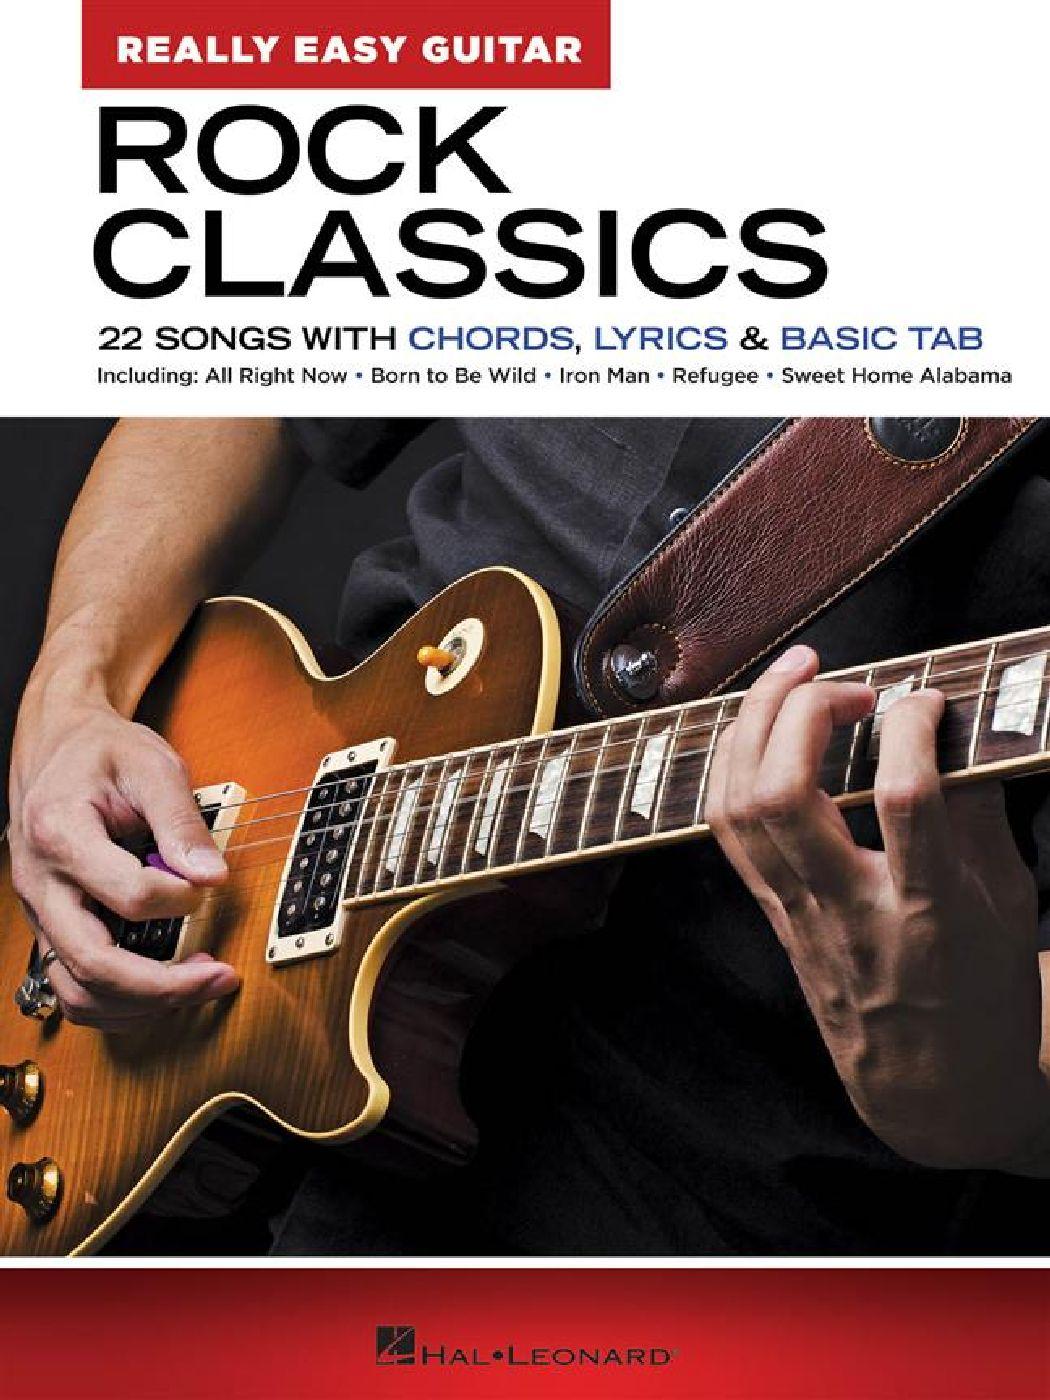 Rock Classics - Really Easy Guitar Series - Guitare Facile